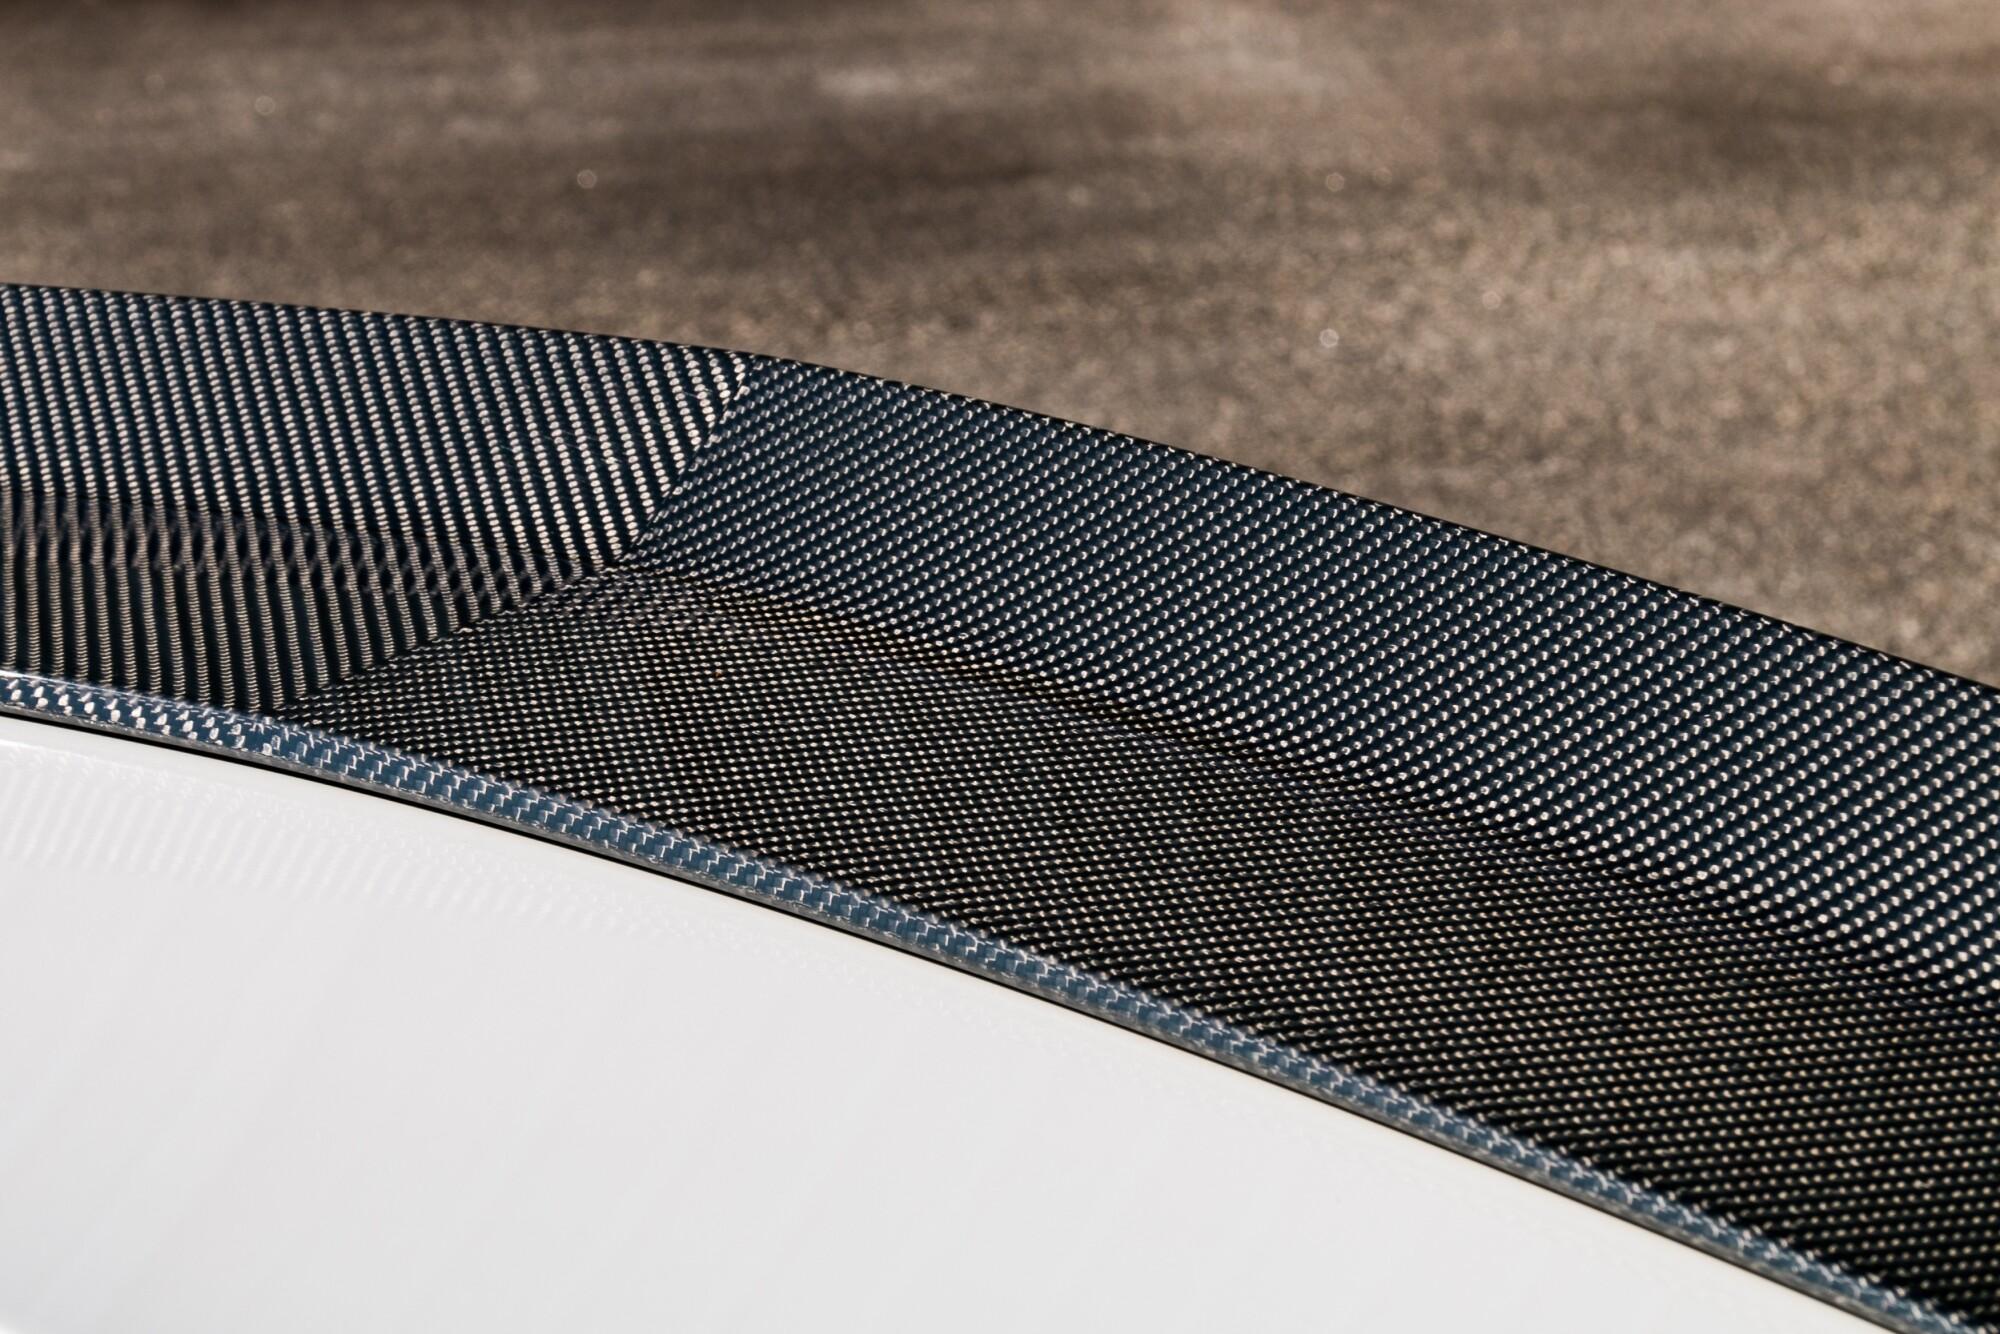 carbon fiber product